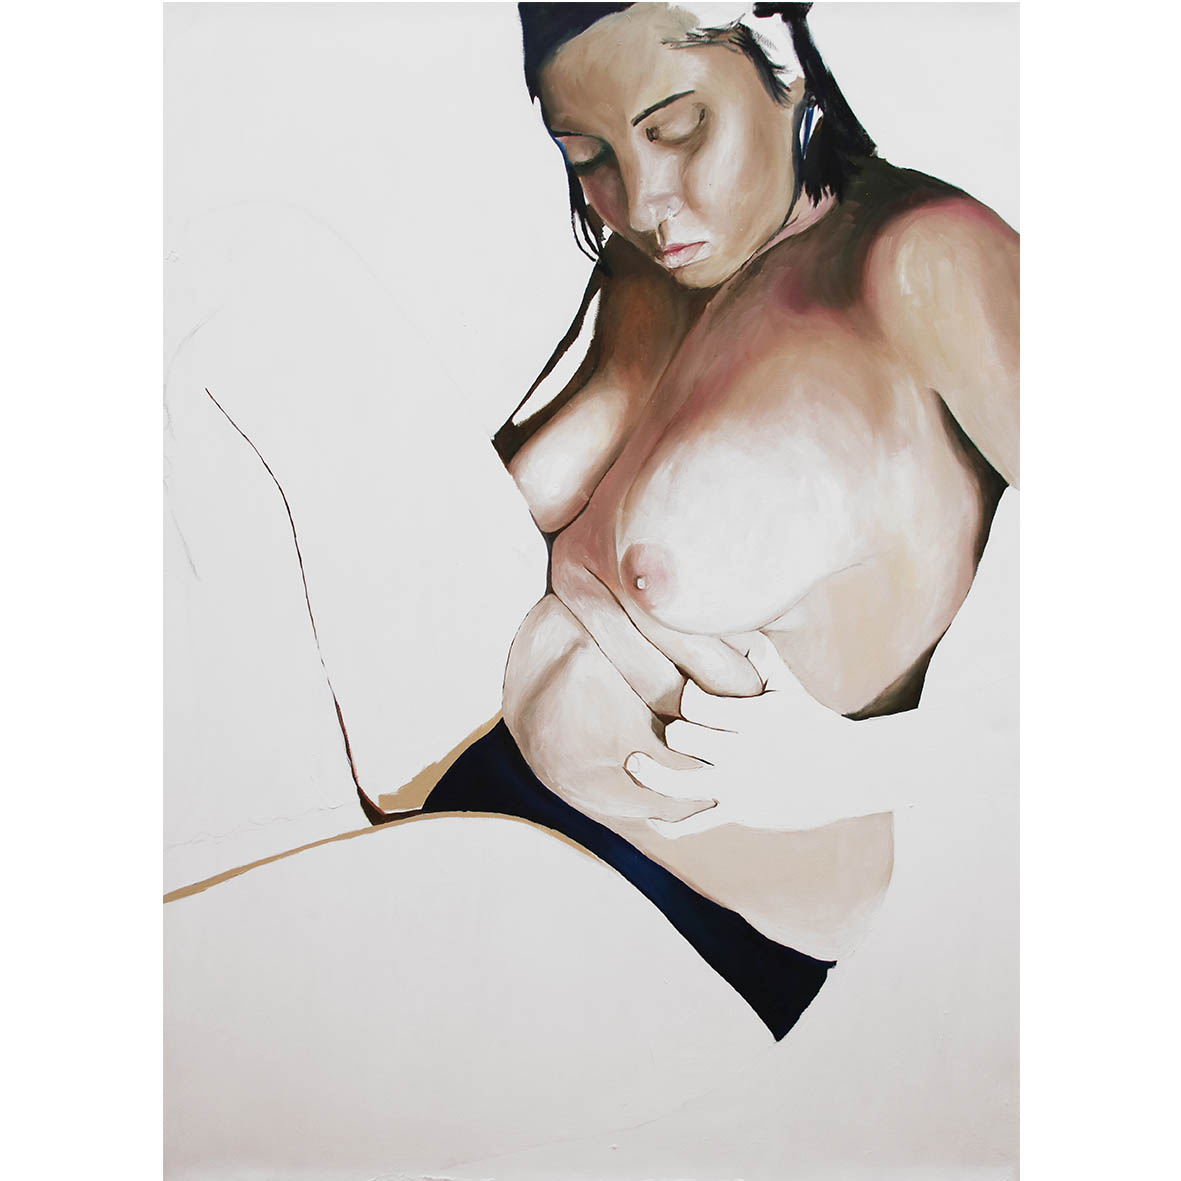 Novisha Steyn Tayla 2017 oil on Canvas 150 x 120 cm